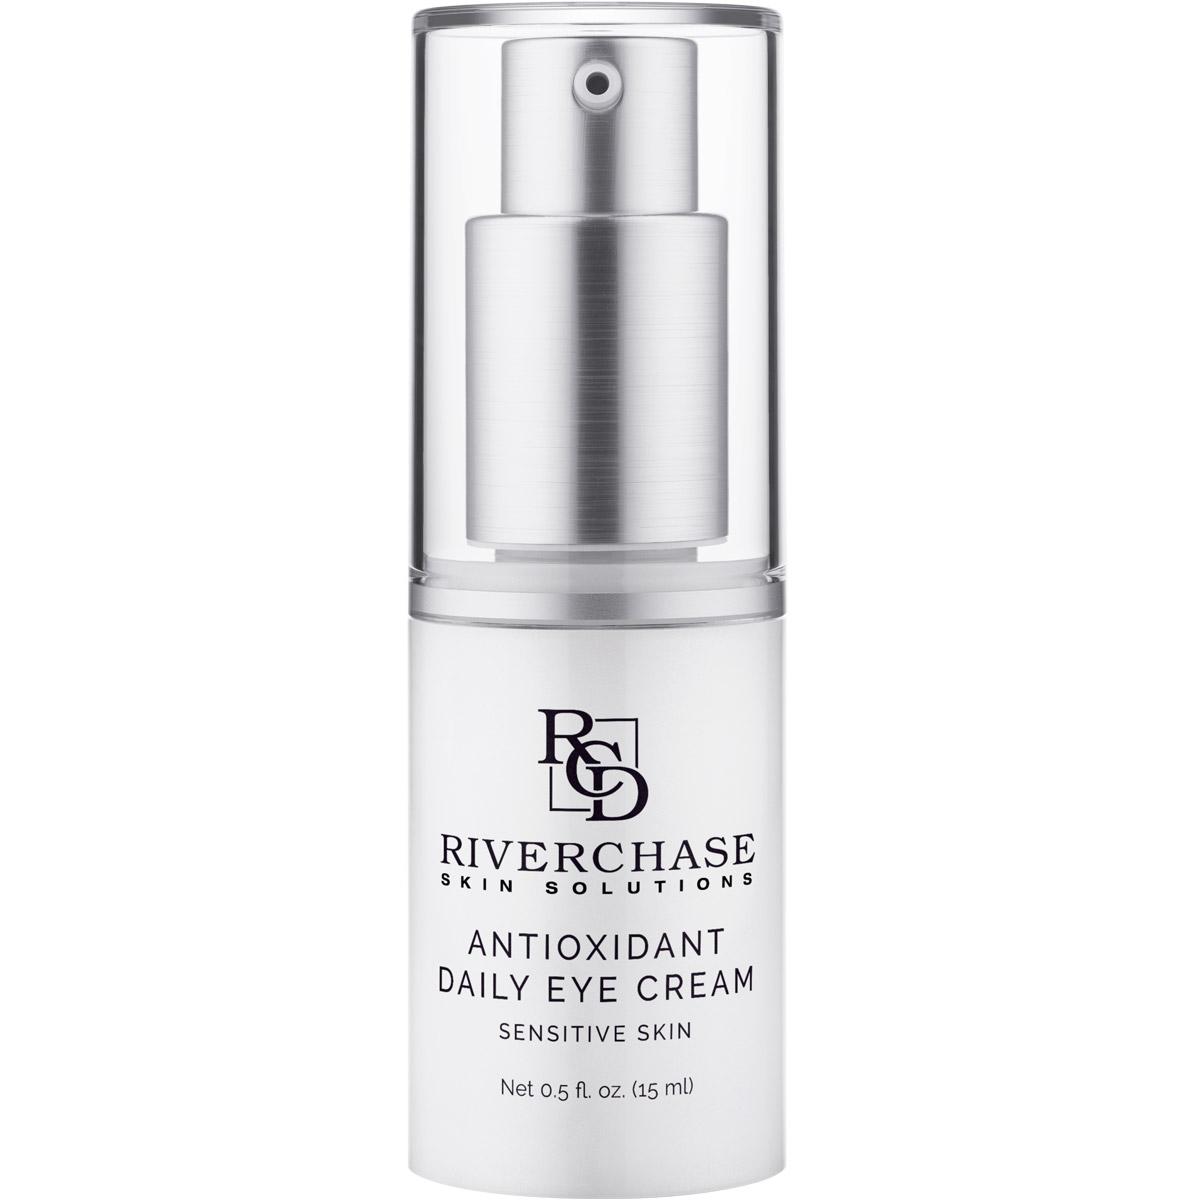 Antioxidant Daily Eye Cream